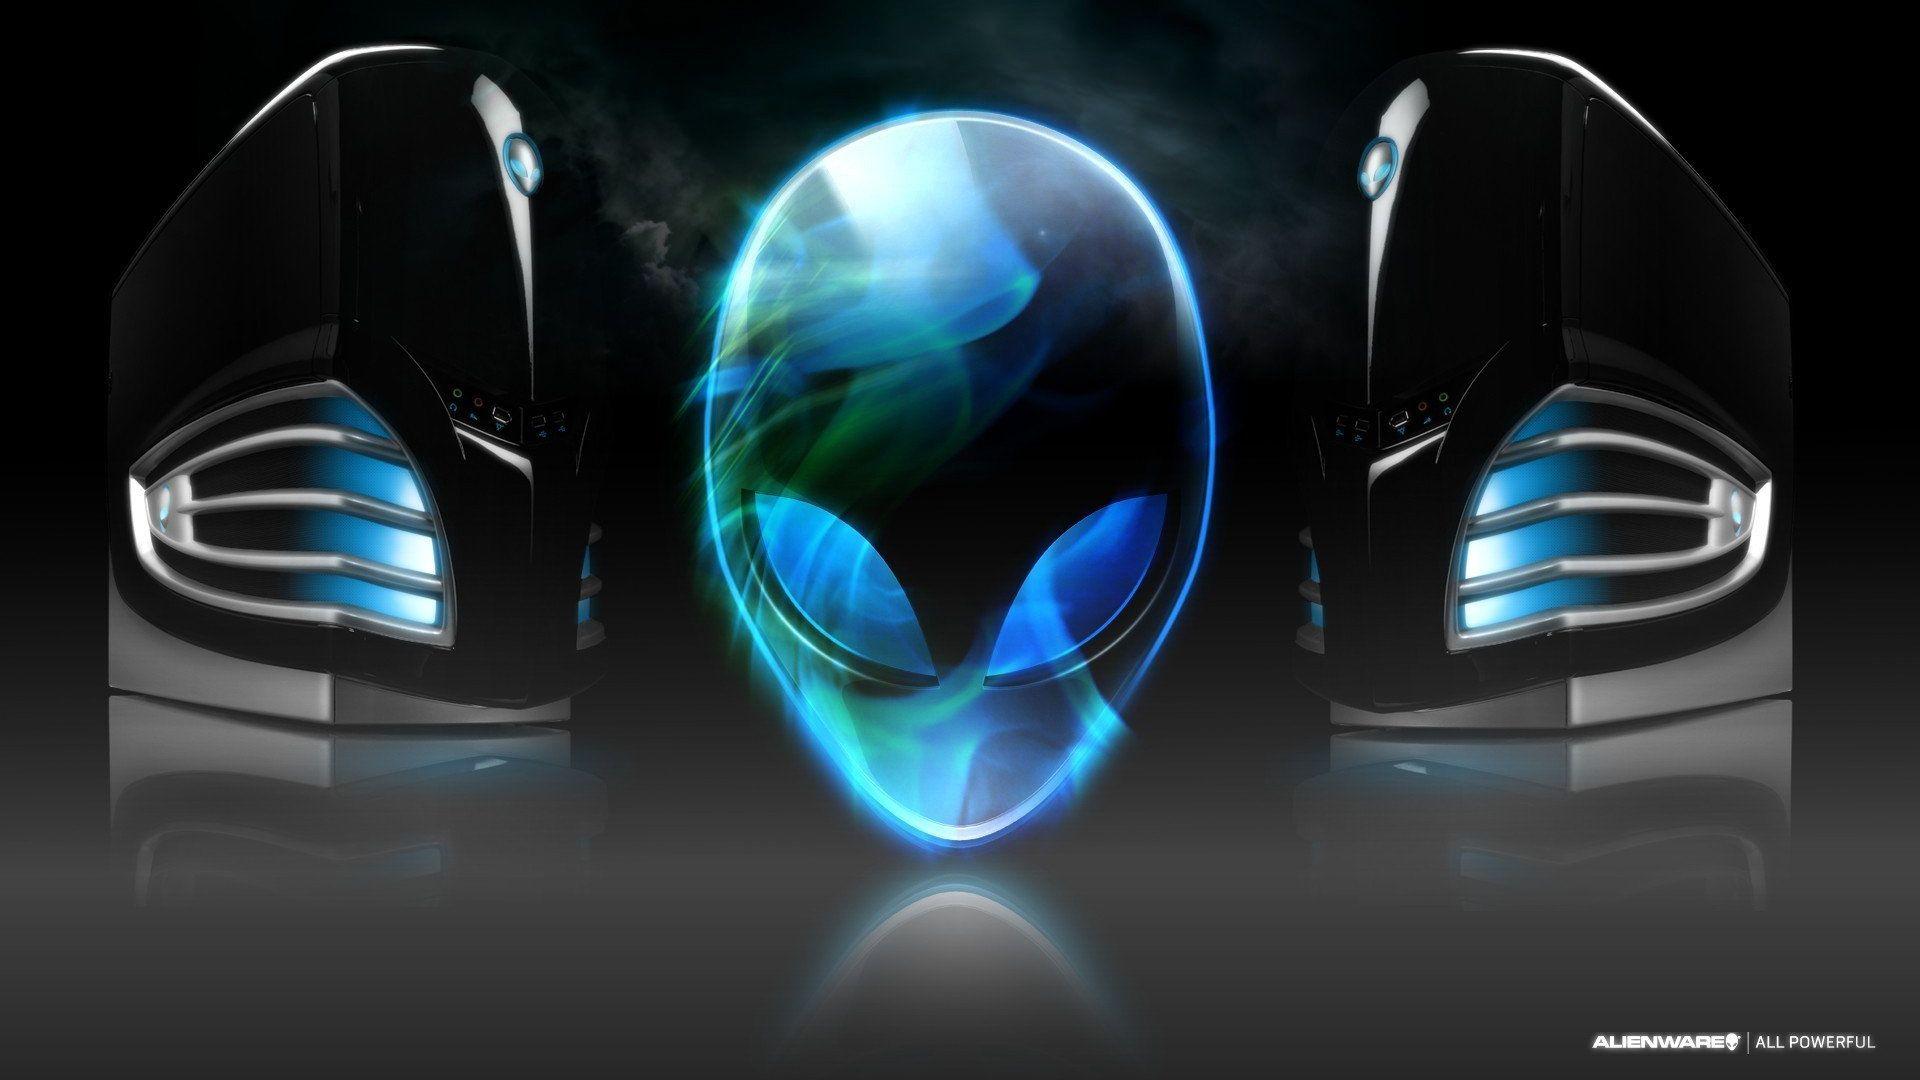 Download X Wallpaper Technology, Light, Technology, Alienware, Automotive